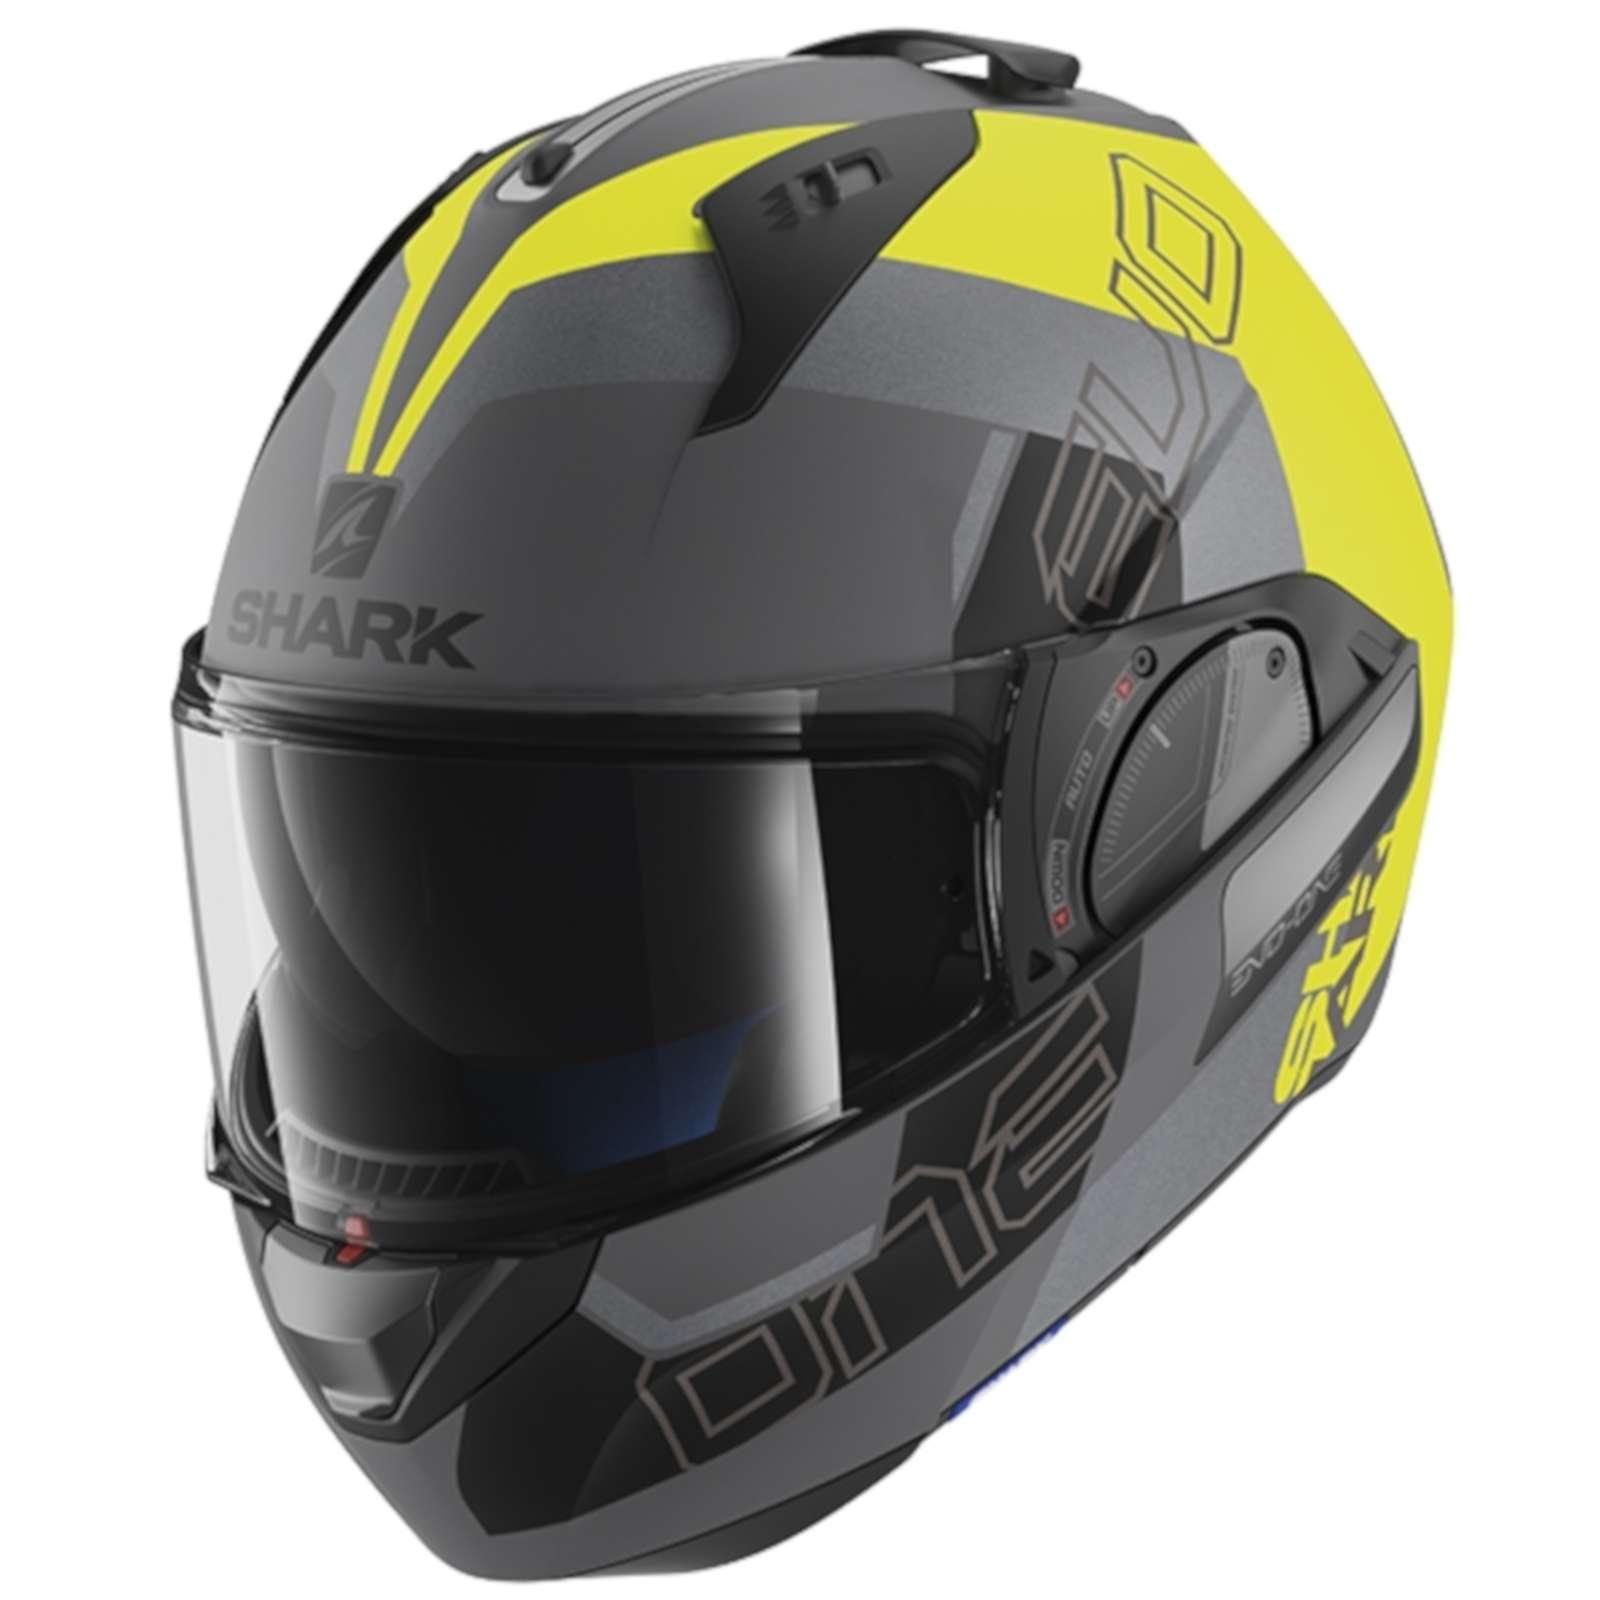 Shark Evo-One 2 Lithion Flip Front Motorcycle Helmet